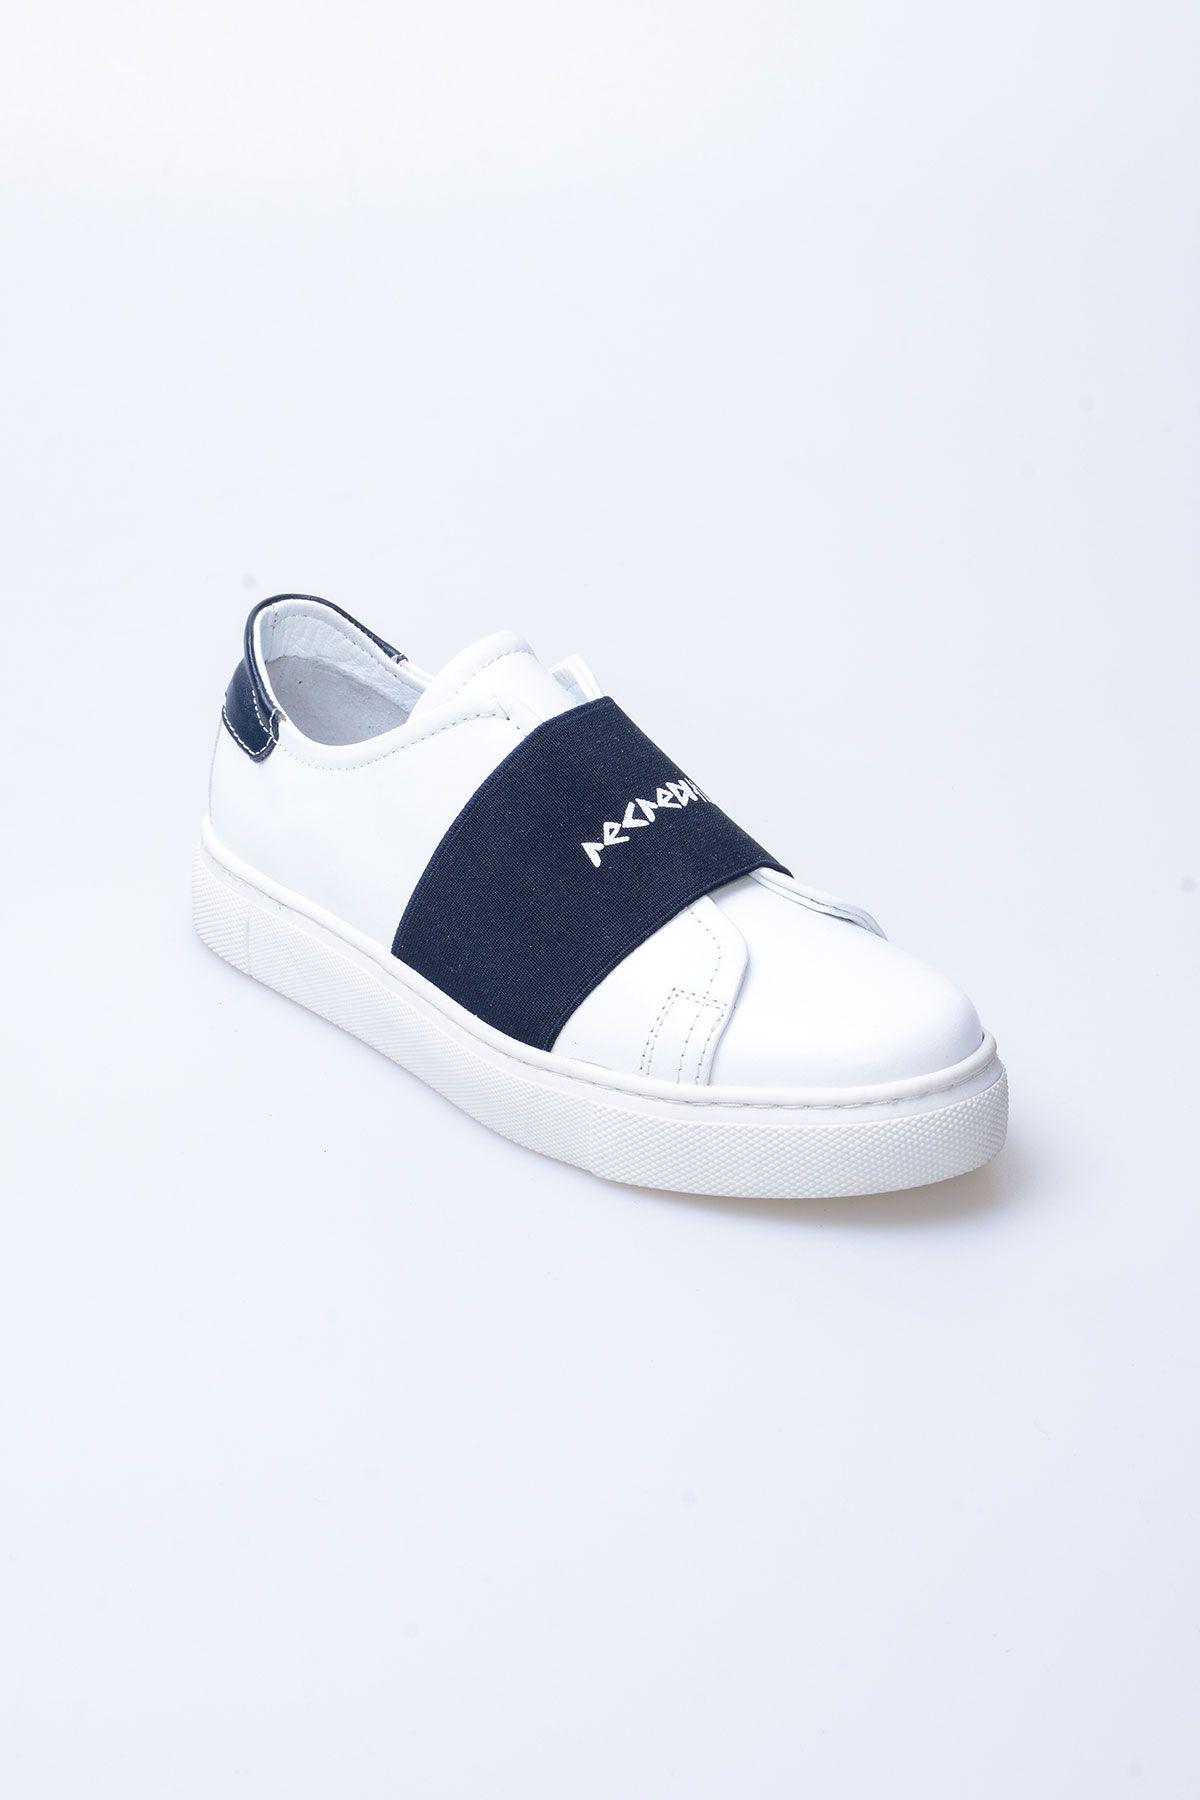 Pegia Recreation Hakiki Deri Bayan Sneaker 19REC101 Lacivert